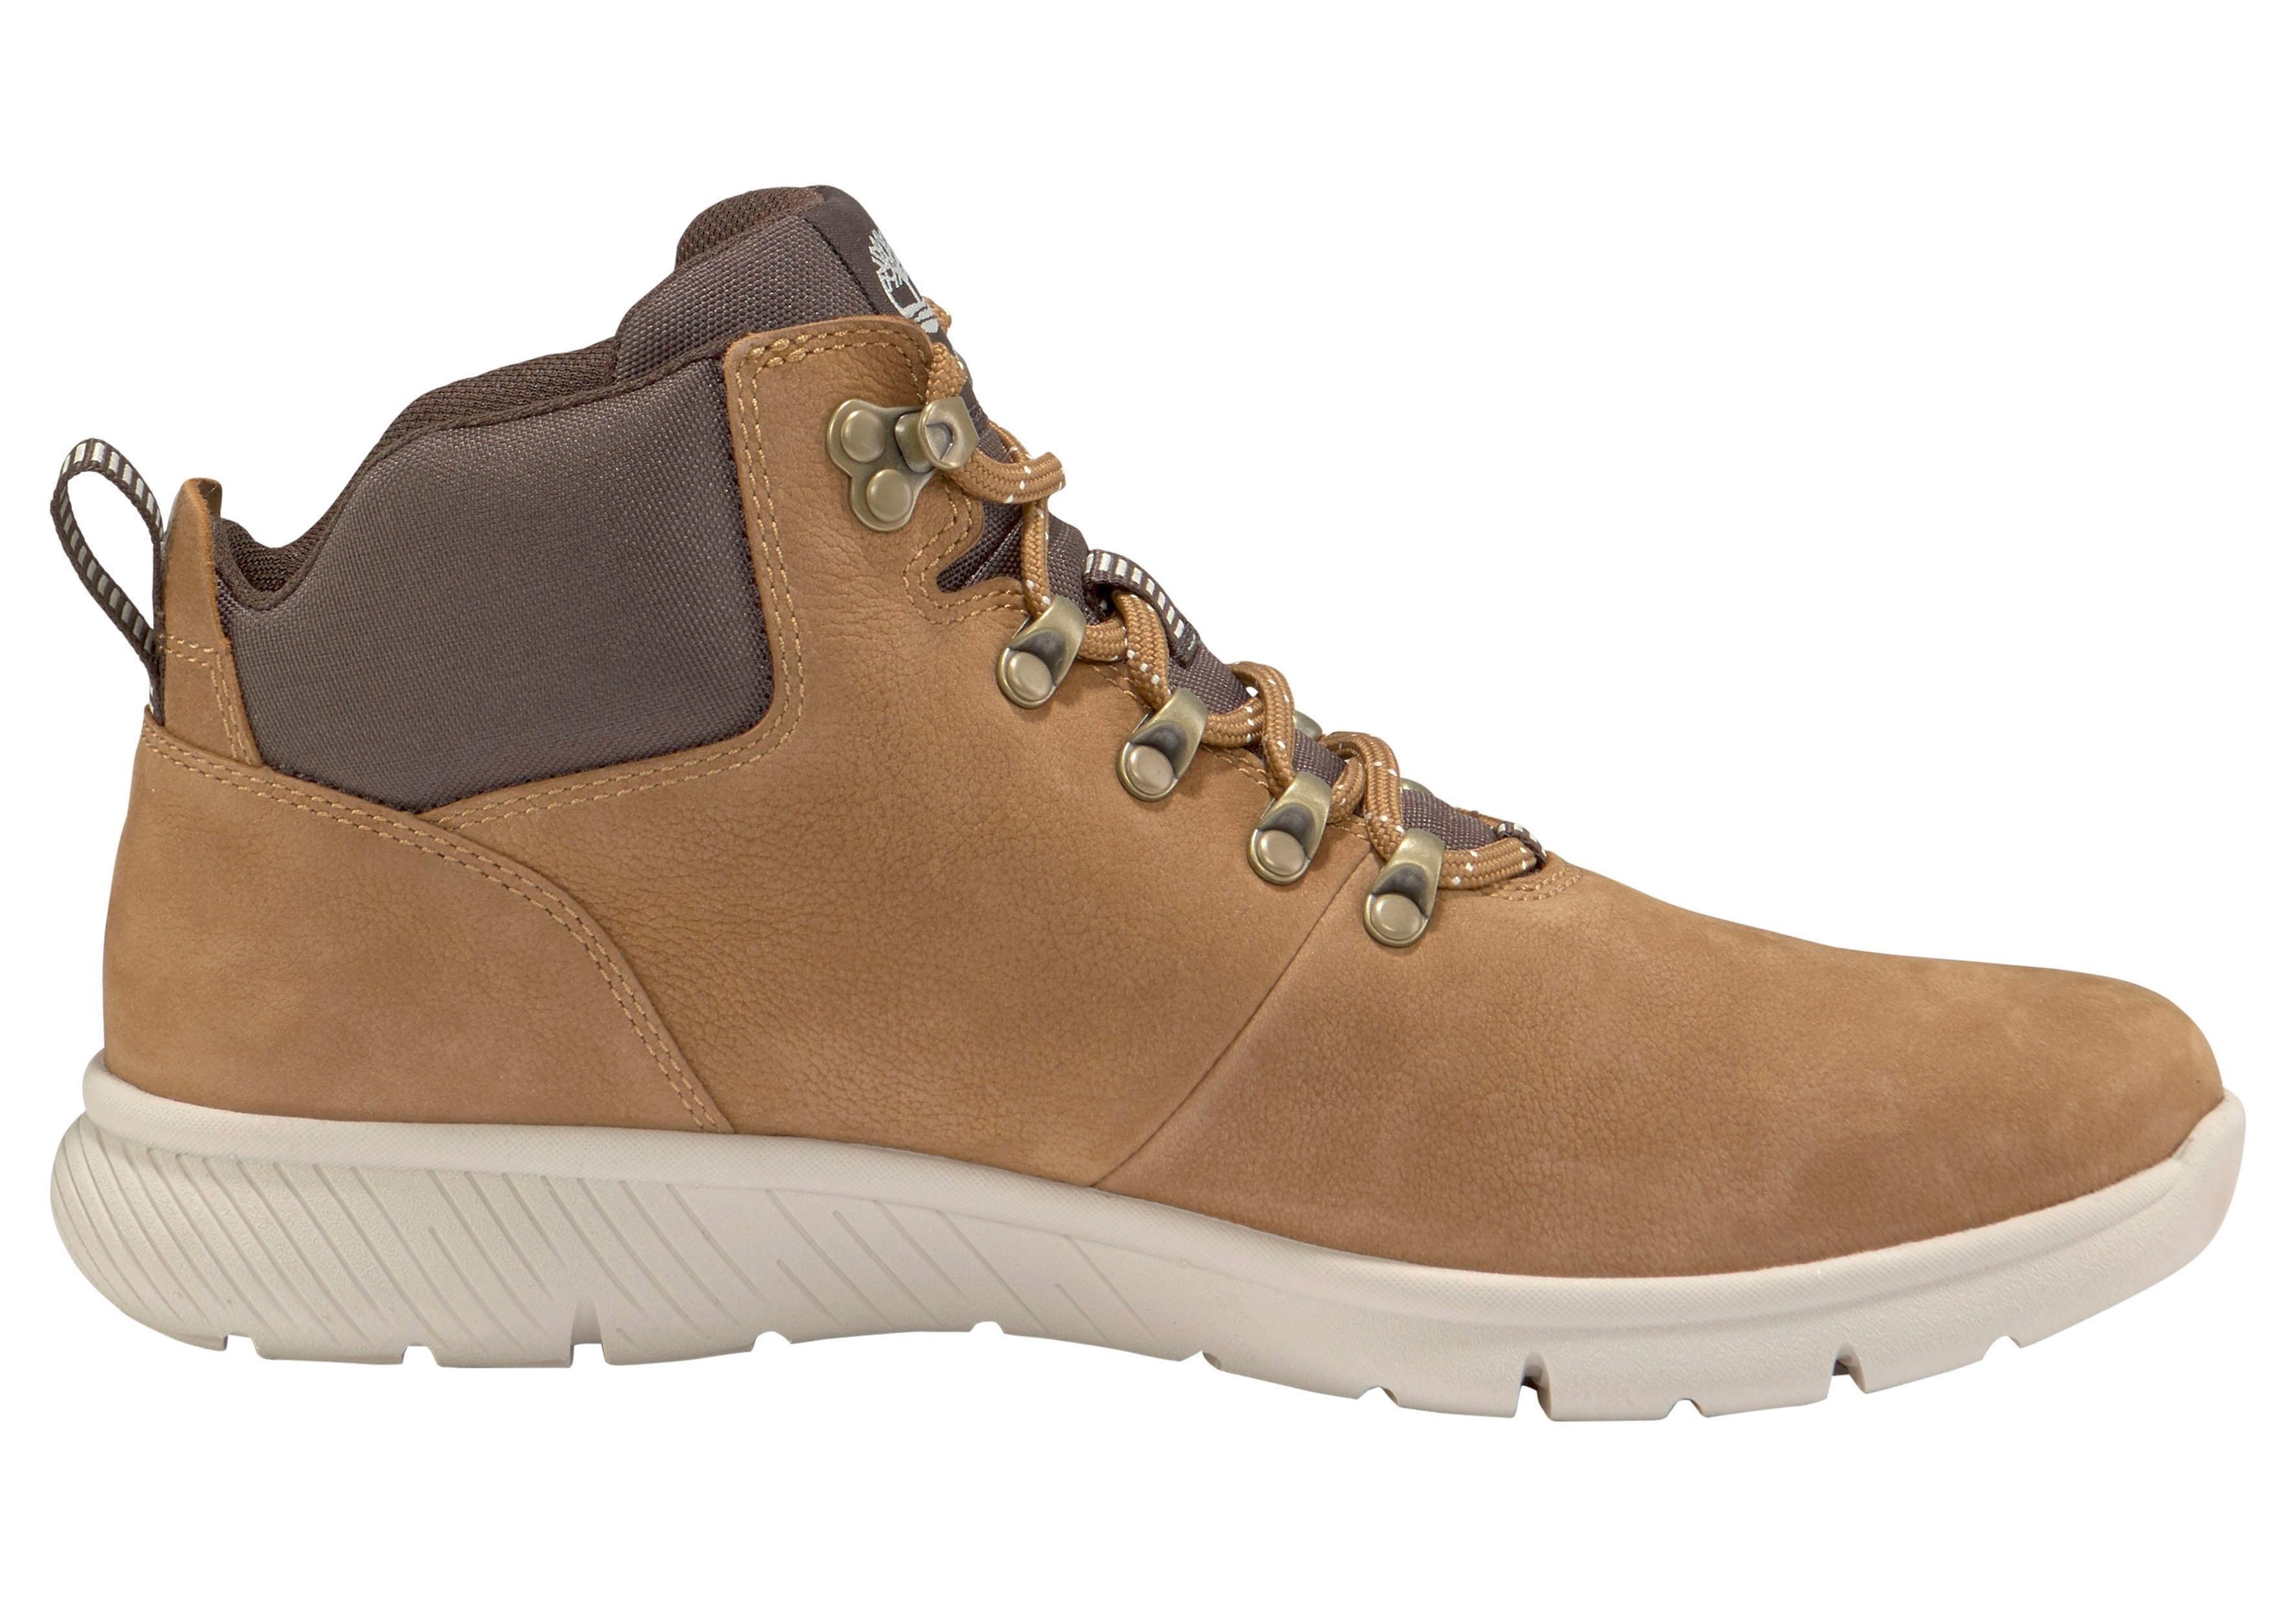 De Sneakersboltero Hiker Shop Timberland In Leather Online 0O8nkXPw